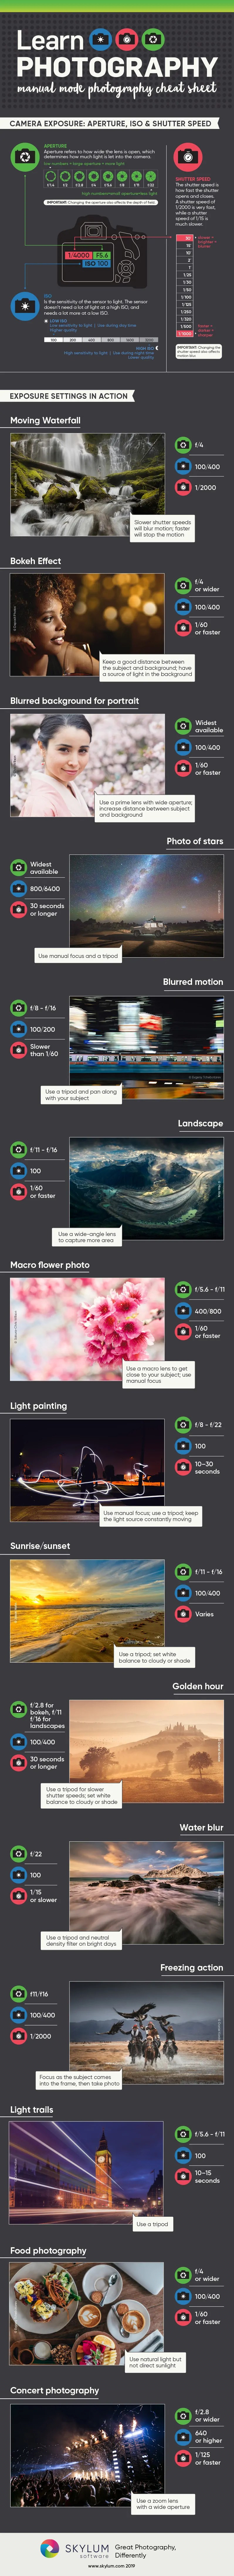 Digital camera buying guide, 5 Best Digital Cameras to buy 2